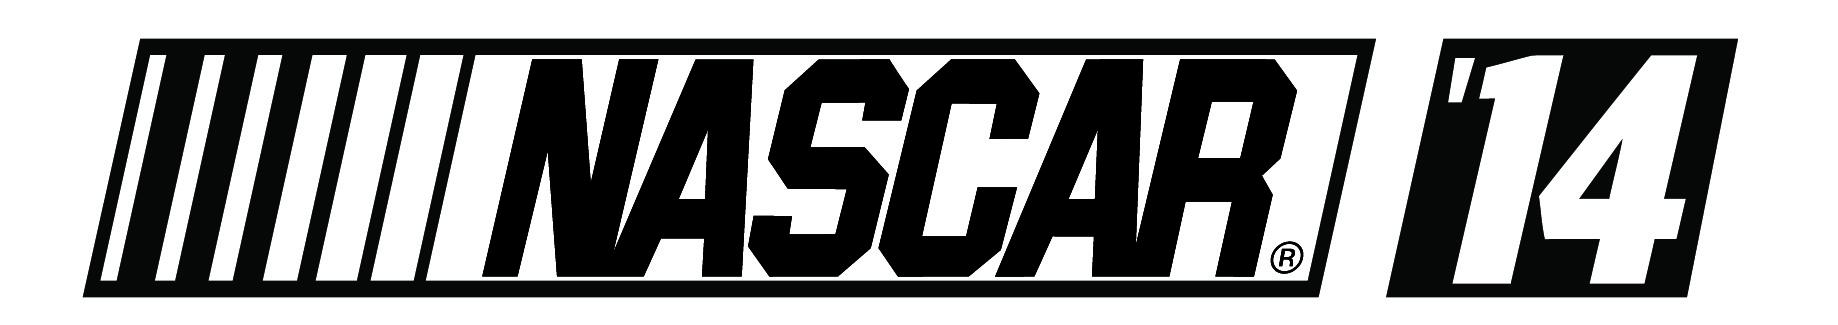 Trailer: NASCAR \u0026#39;14 hitting PC, 360 and PS3 on February 18 - onPause